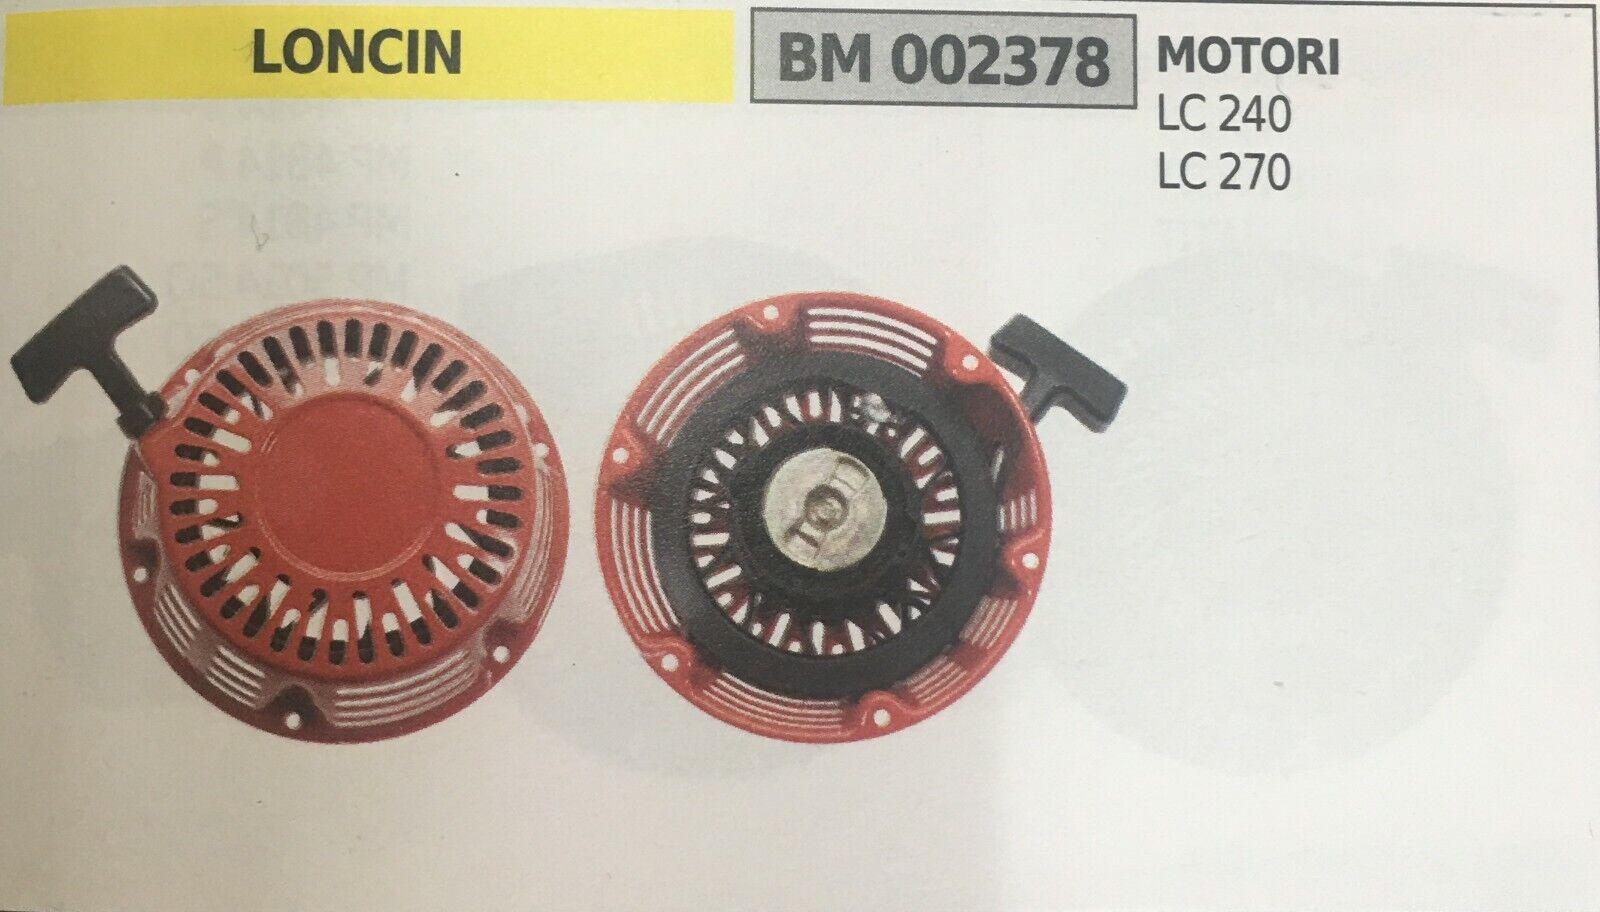 AVVIAMENTO COMPLETO BRUMAR LONCIN BM002378